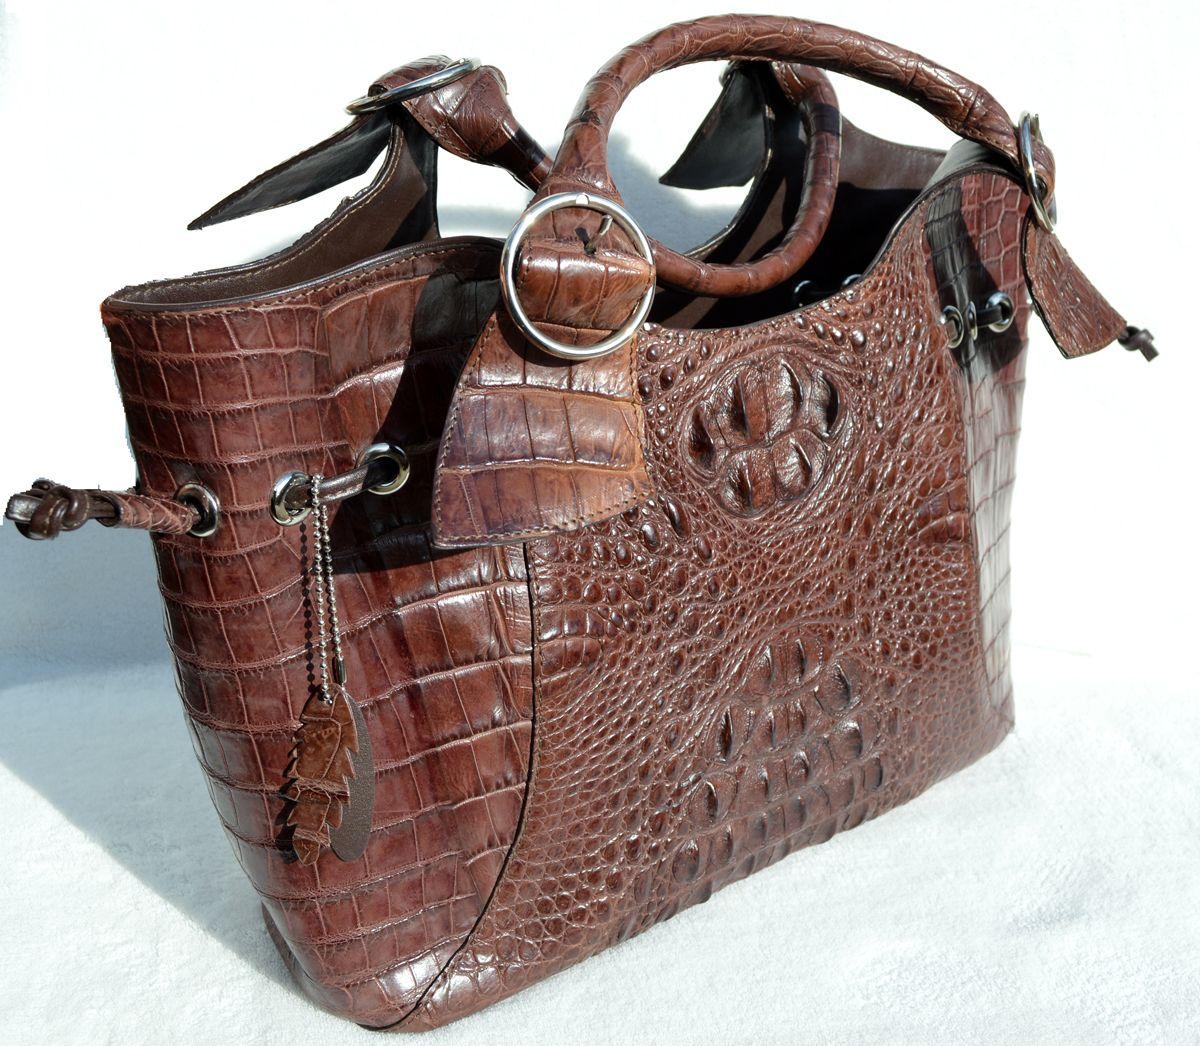 253dda48ab1f AMPLE 16 x 10 Early 2000 s TOBACCO Brown Hornback CROCODILE Skin Shoulder  Bag TOTE Satchel